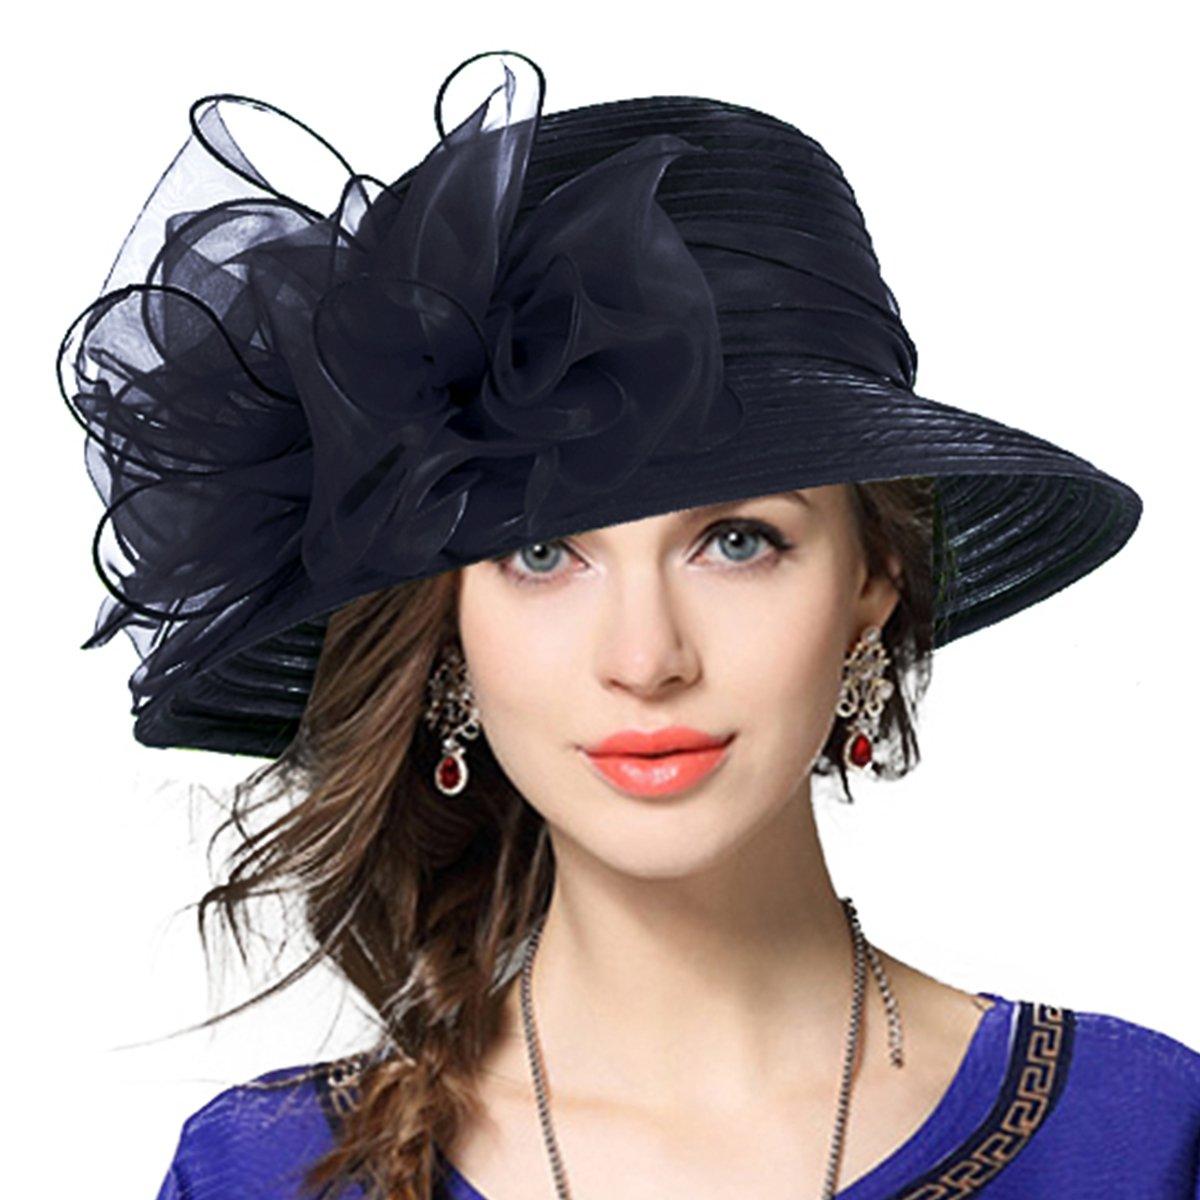 VECRY Lady Derby Dress Church Cloche Hat Bow Bucket Wedding Bowler Hats (Black, Medium) by VECRY